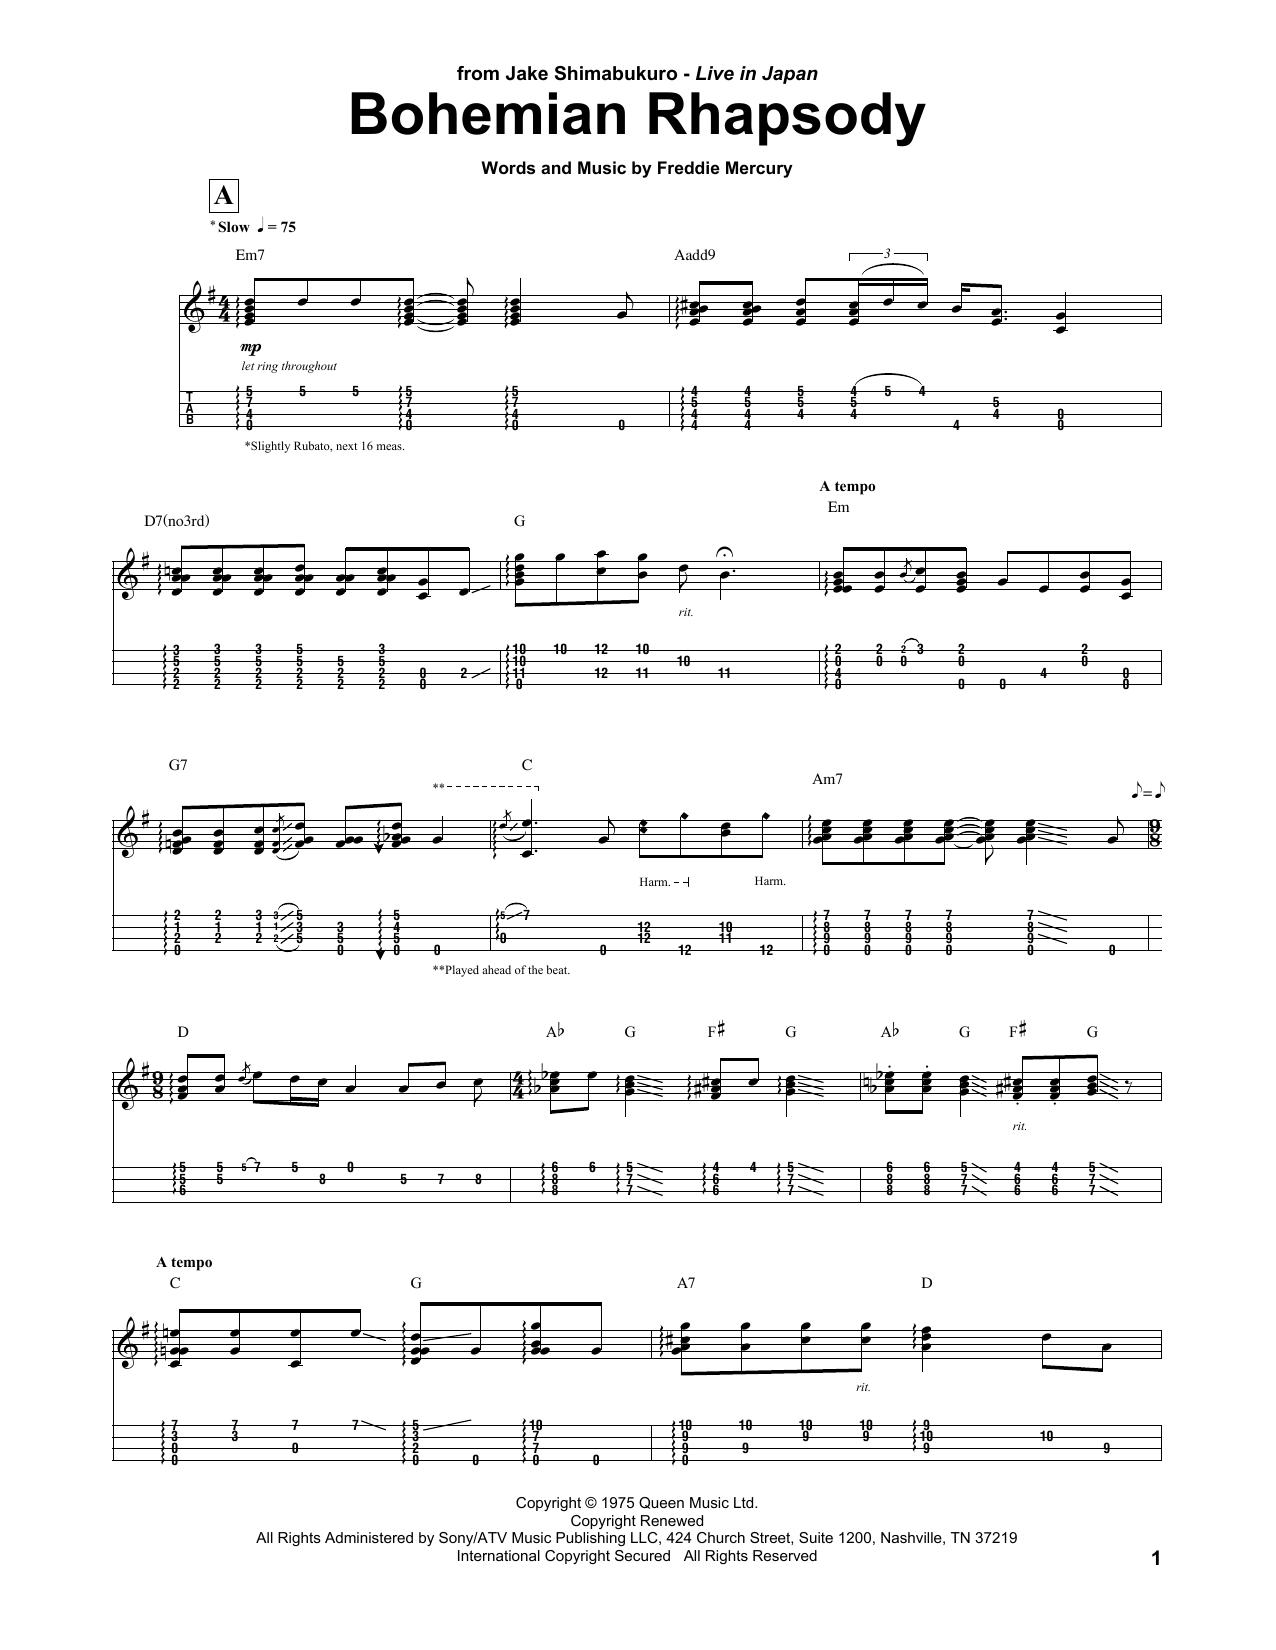 Bohemian Rhapsody Arr Jake Shimabukuro Ukulele Tab